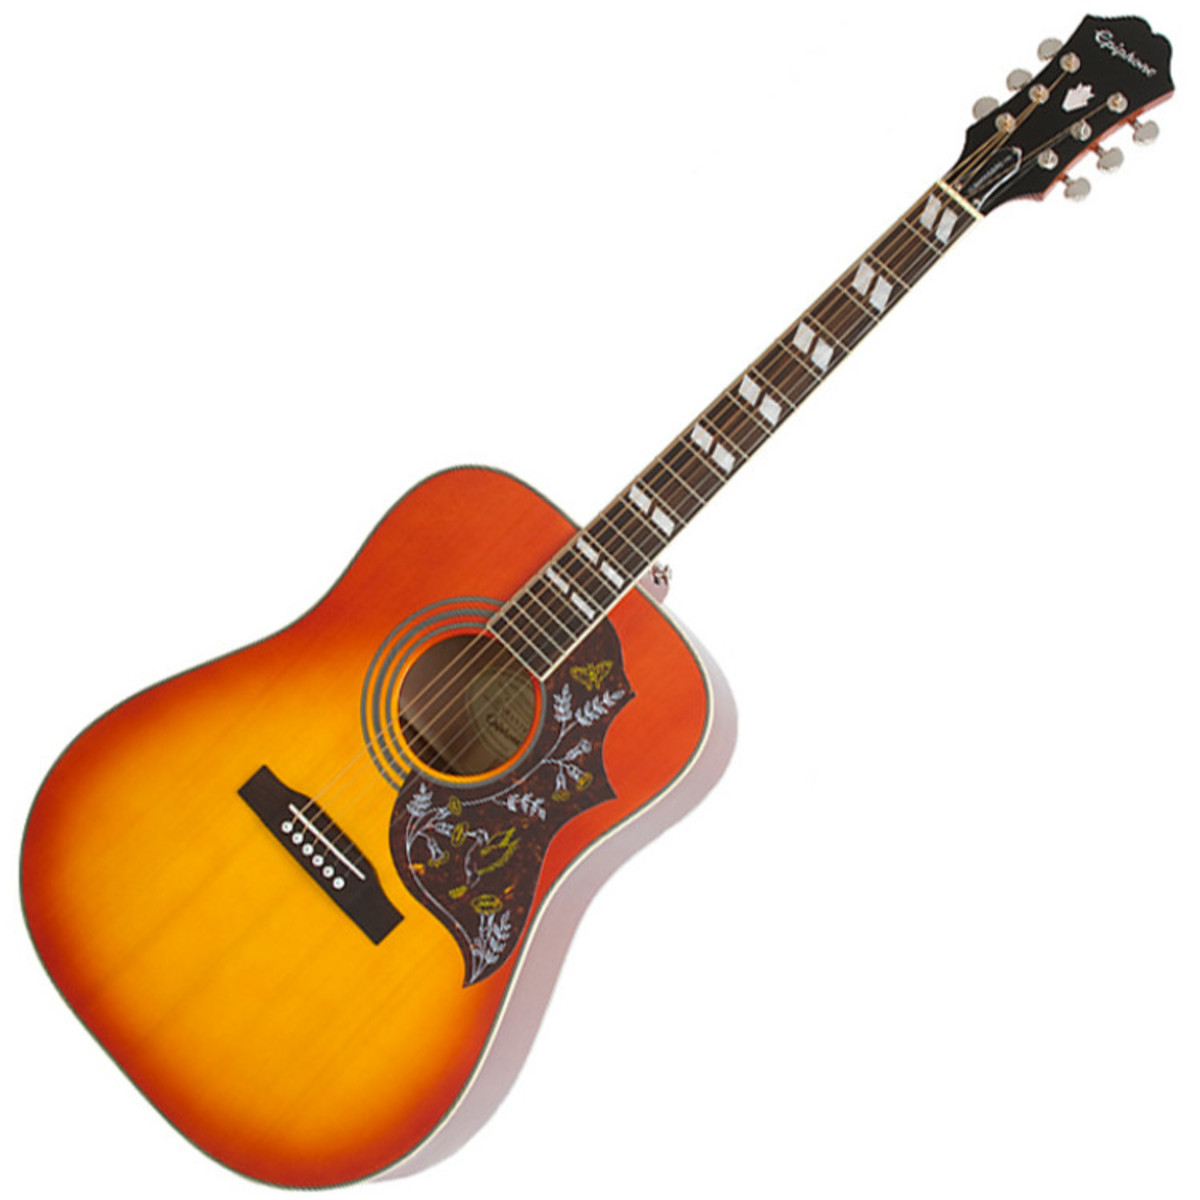 epiphone hummingbird pro electro acoustic guitar b stock at. Black Bedroom Furniture Sets. Home Design Ideas